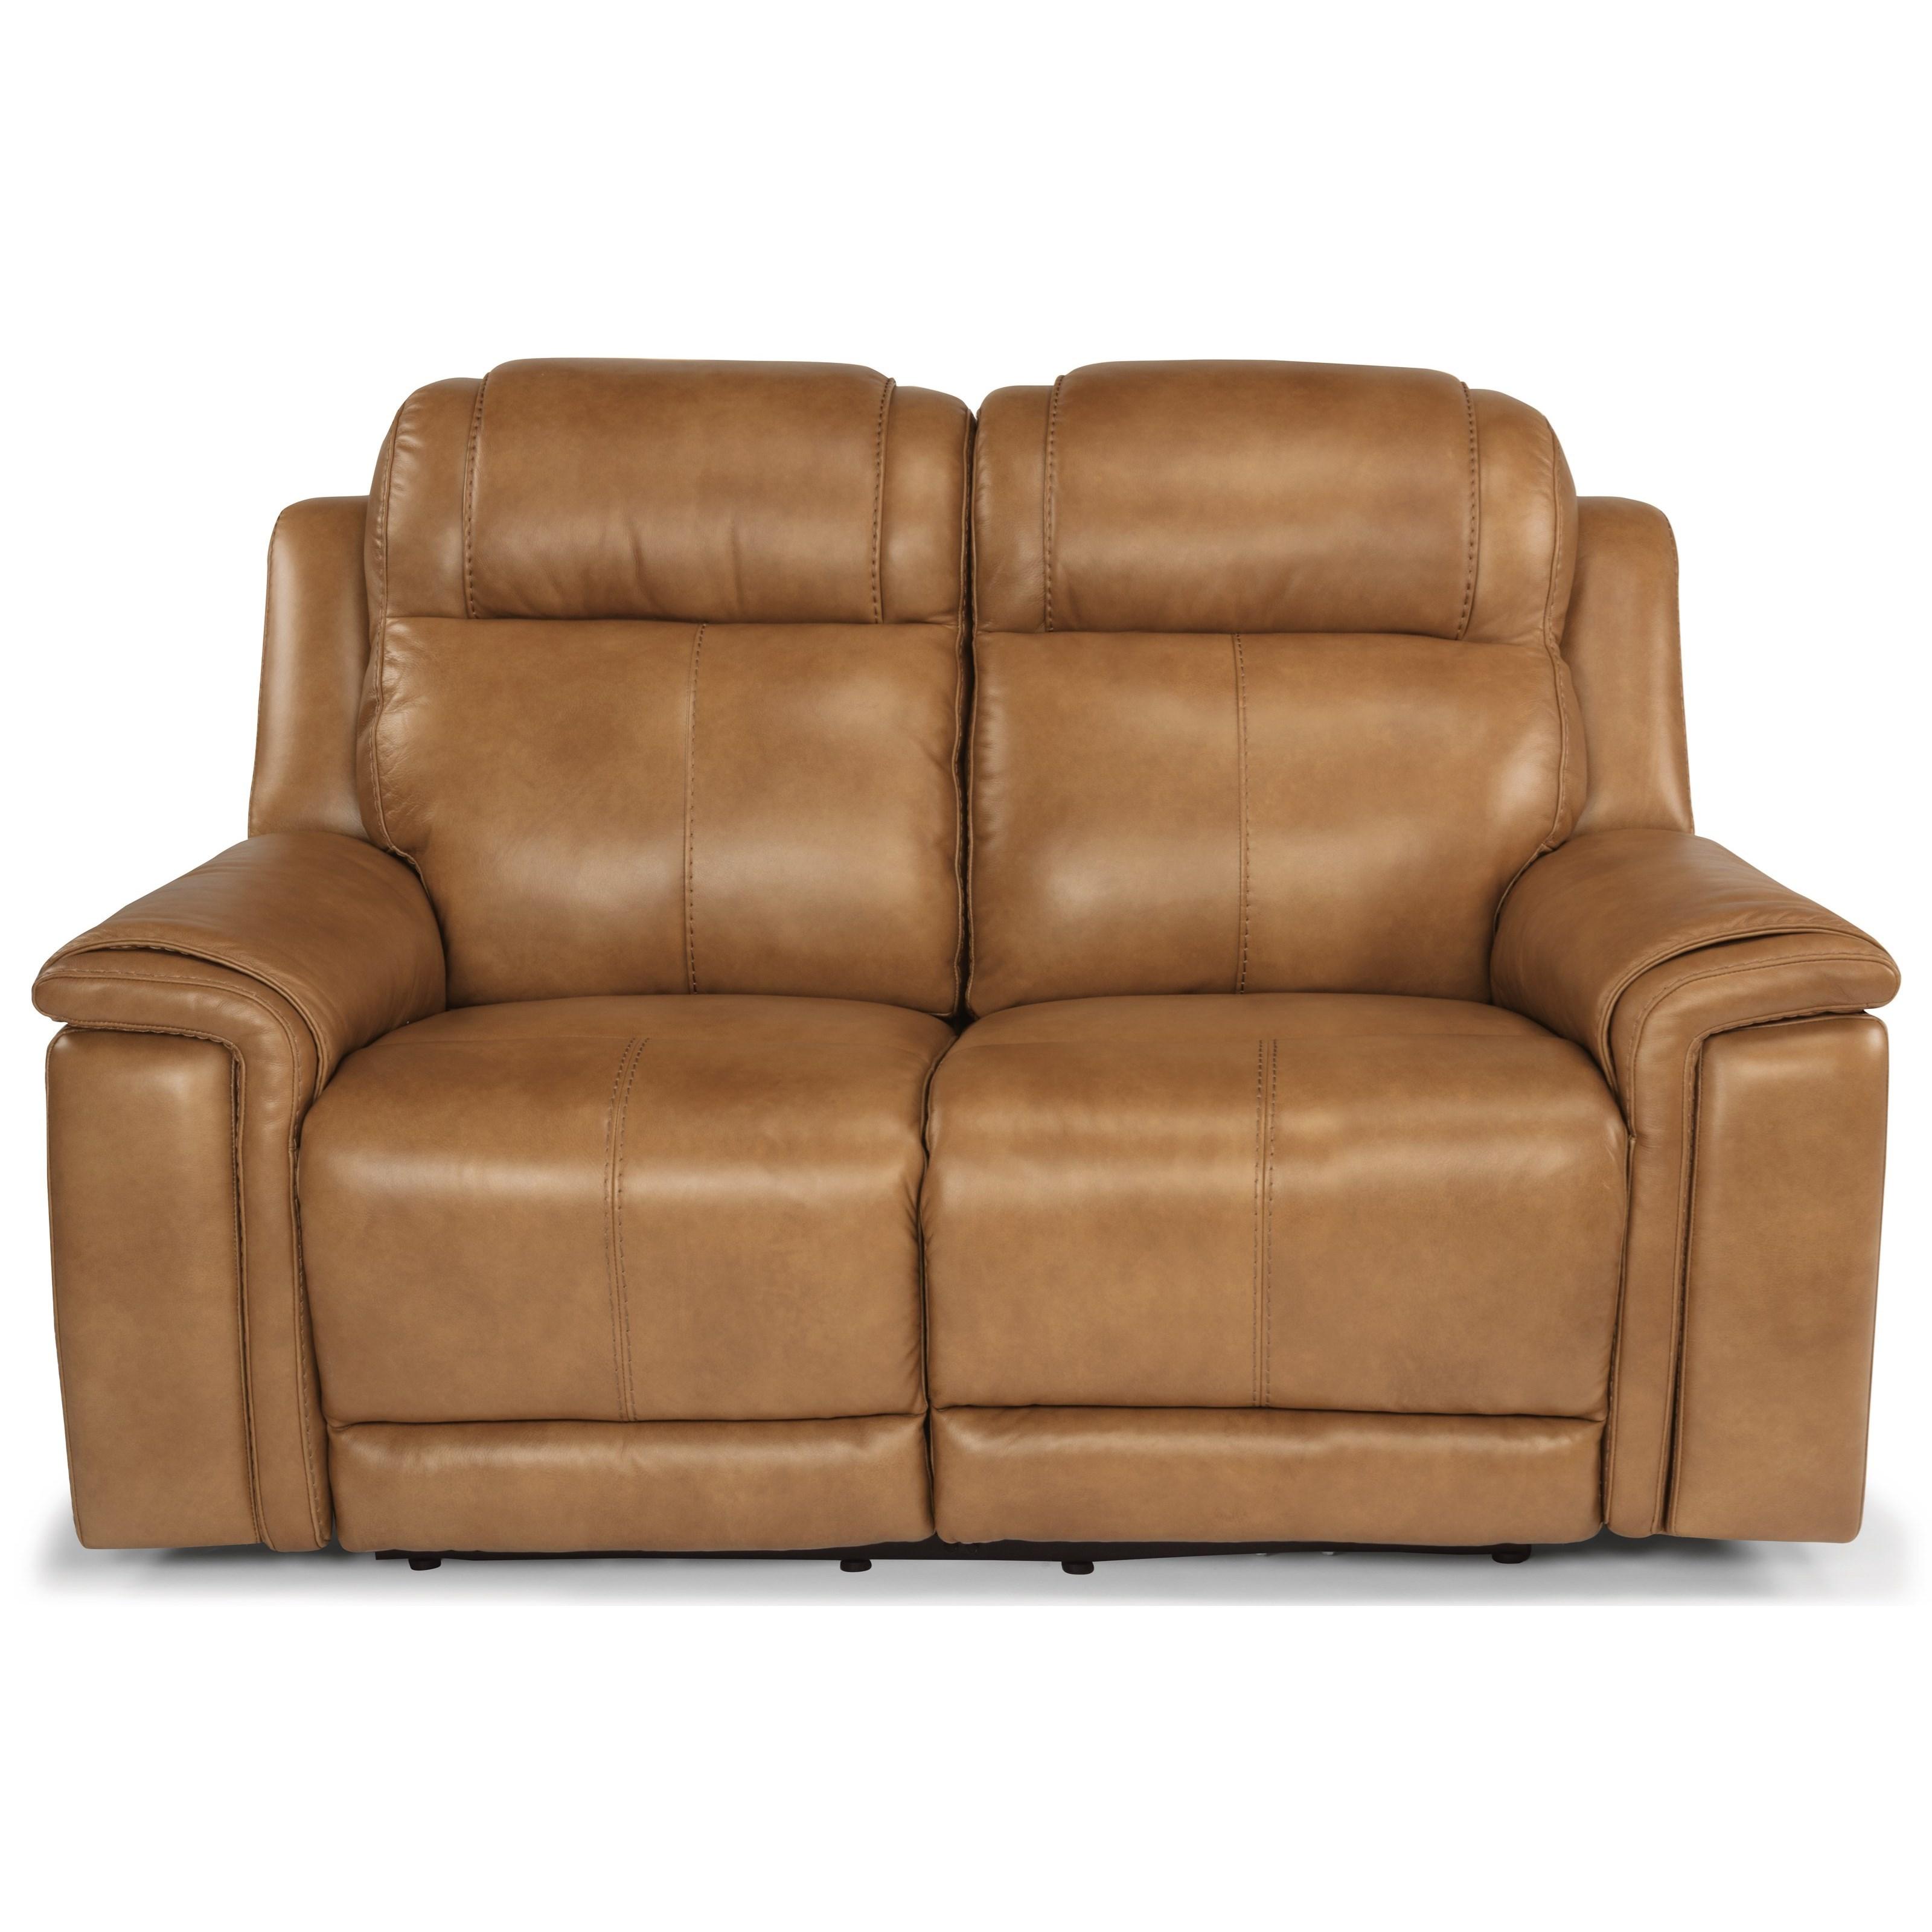 Latitudes - Kingsley Lay-Flat Power Reclining Loveseat by Flexsteel at Mueller Furniture